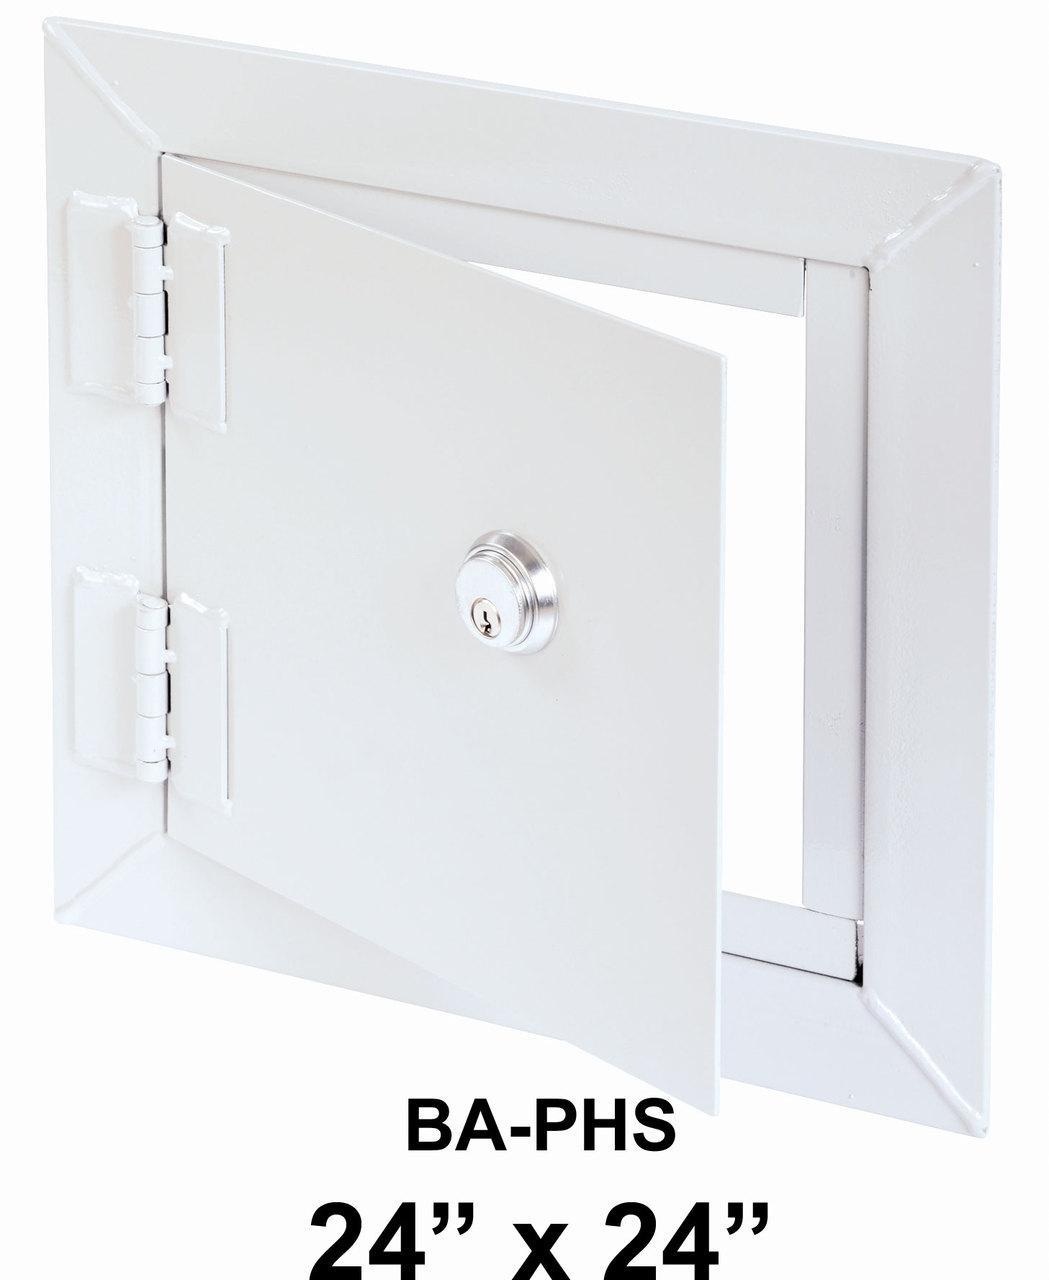 Access Panels 24 x 24 BA-PHS High Security Access - BEST